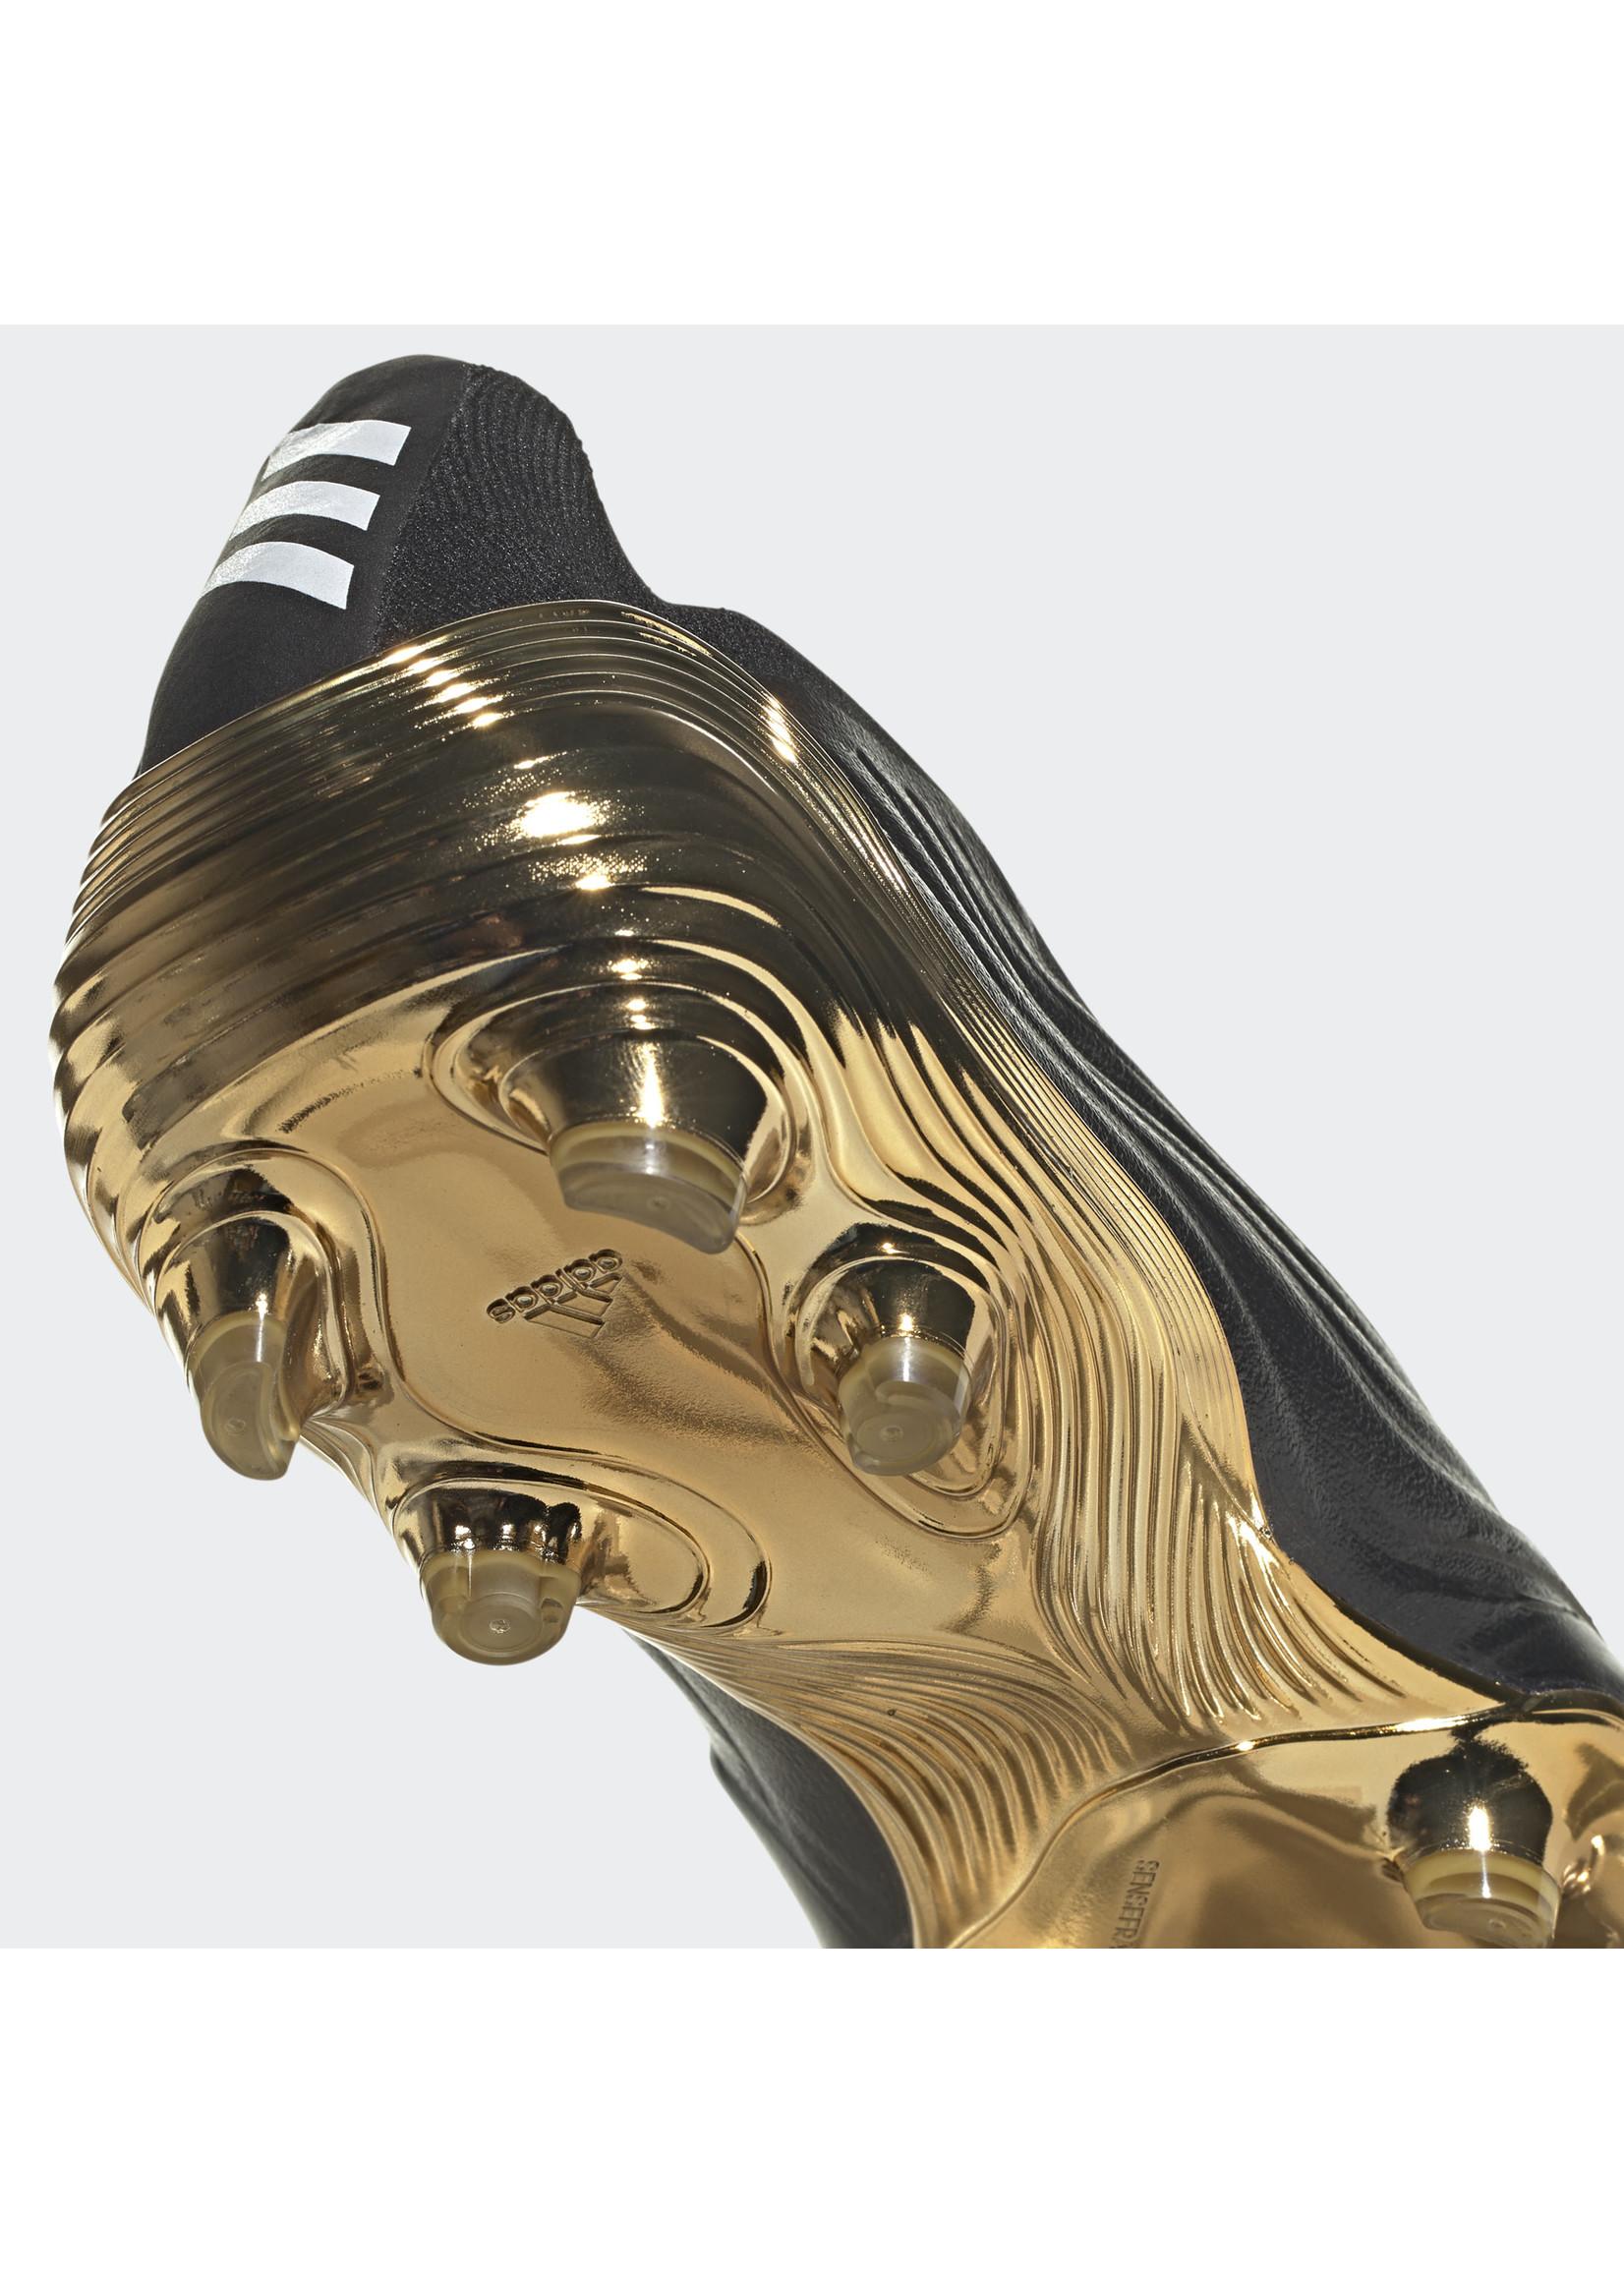 Adidas Copa Sense+ FG - Black/Gold